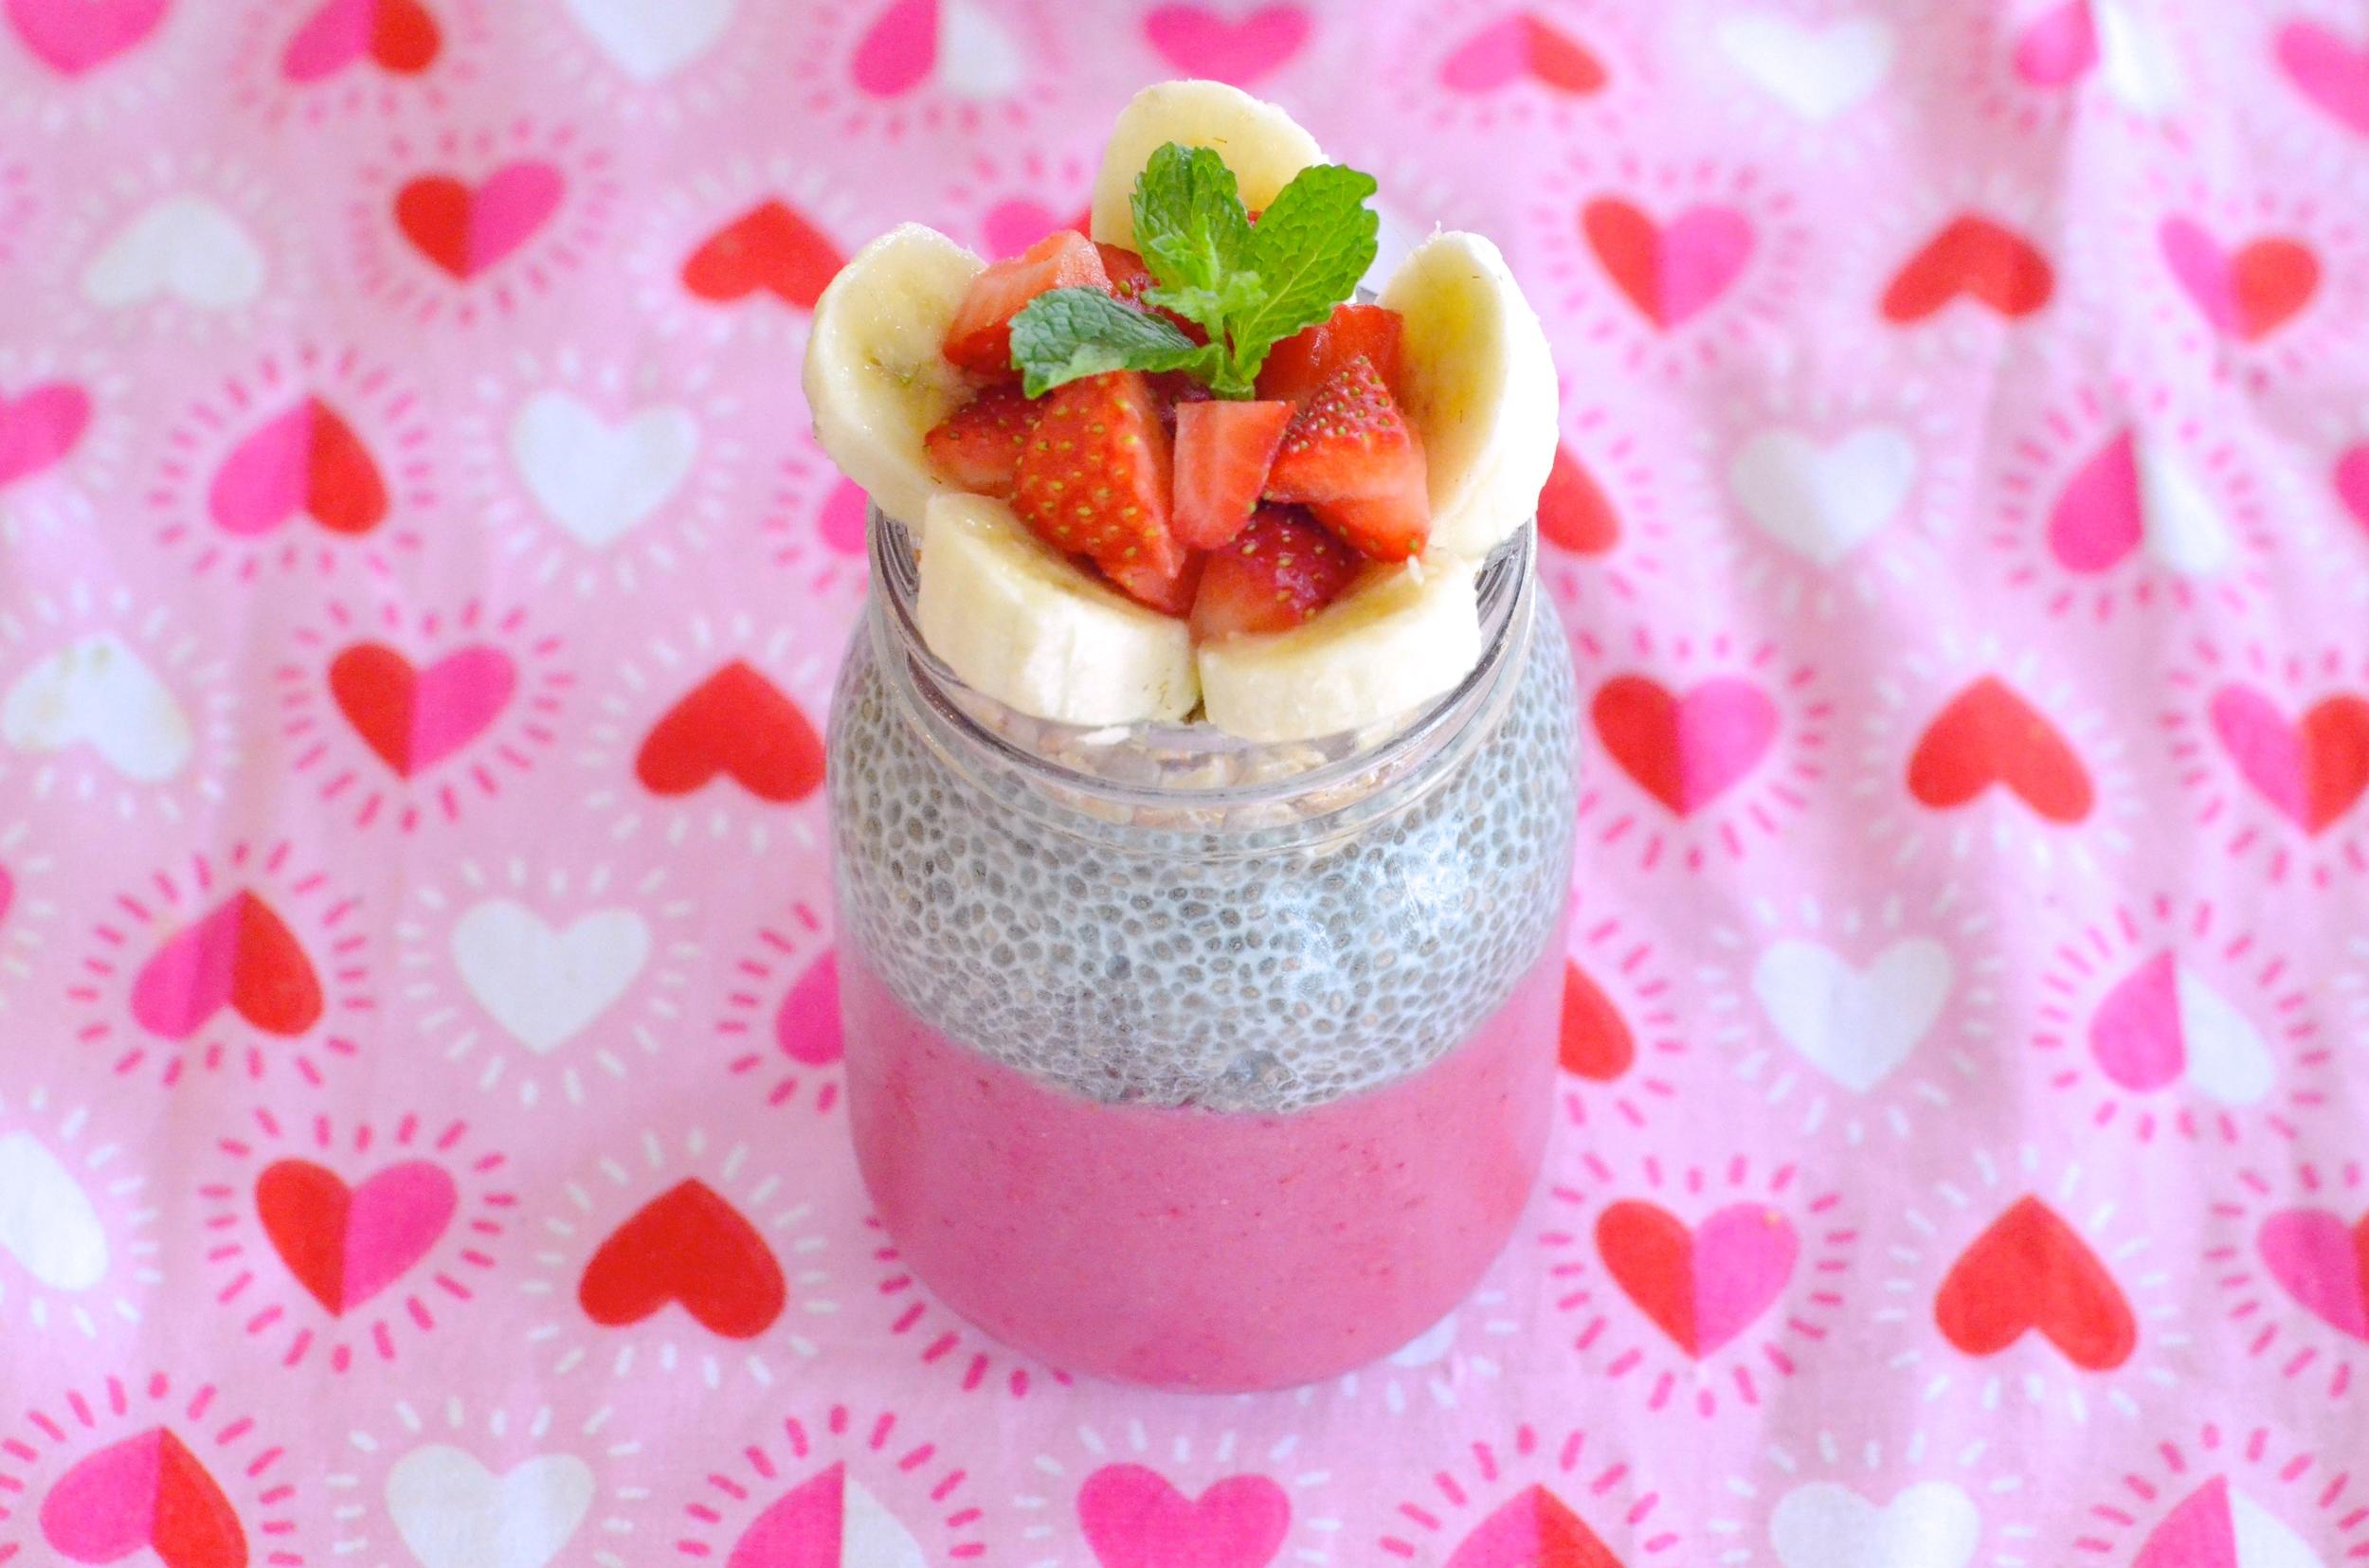 Strawberry Banana Smoothie/Chia Pudding Parfait